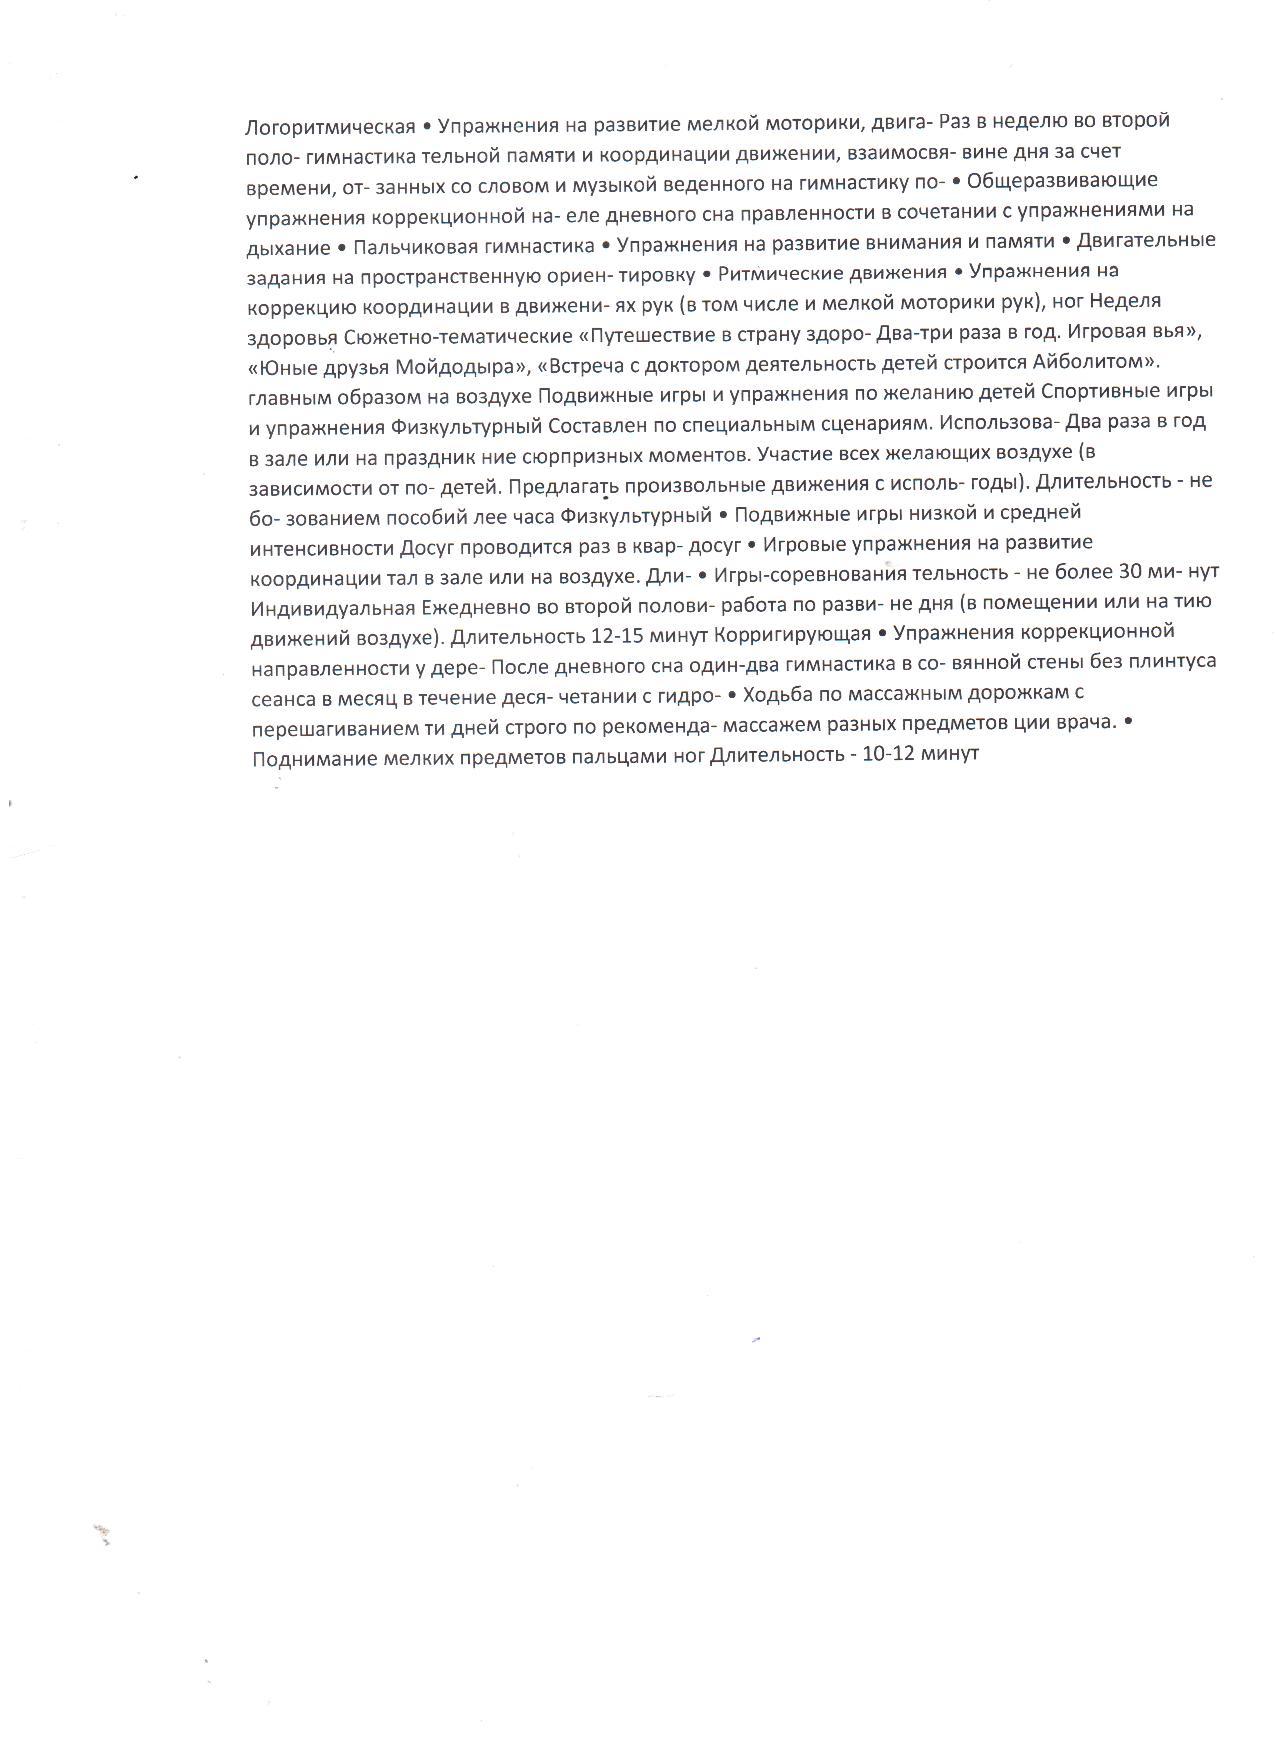 F:\для Татьяны Юрьевны доклады амировой\2\2 005.jpg